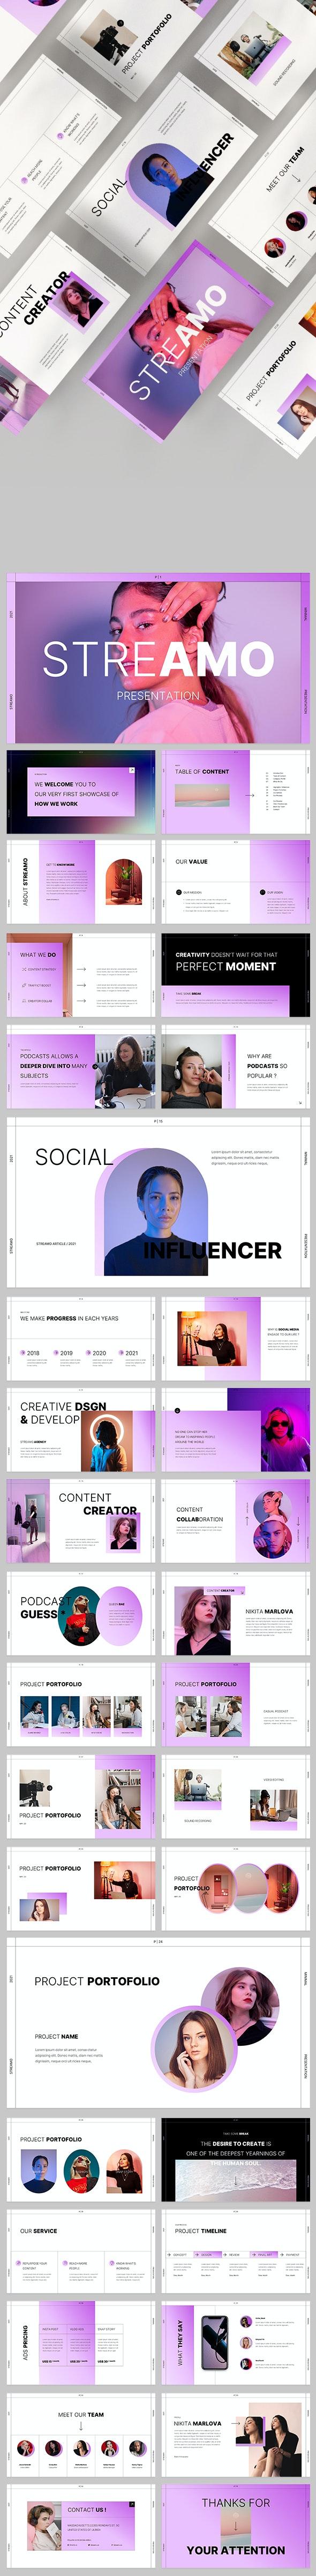 Streamo Powerpoint - Creative PowerPoint Templates